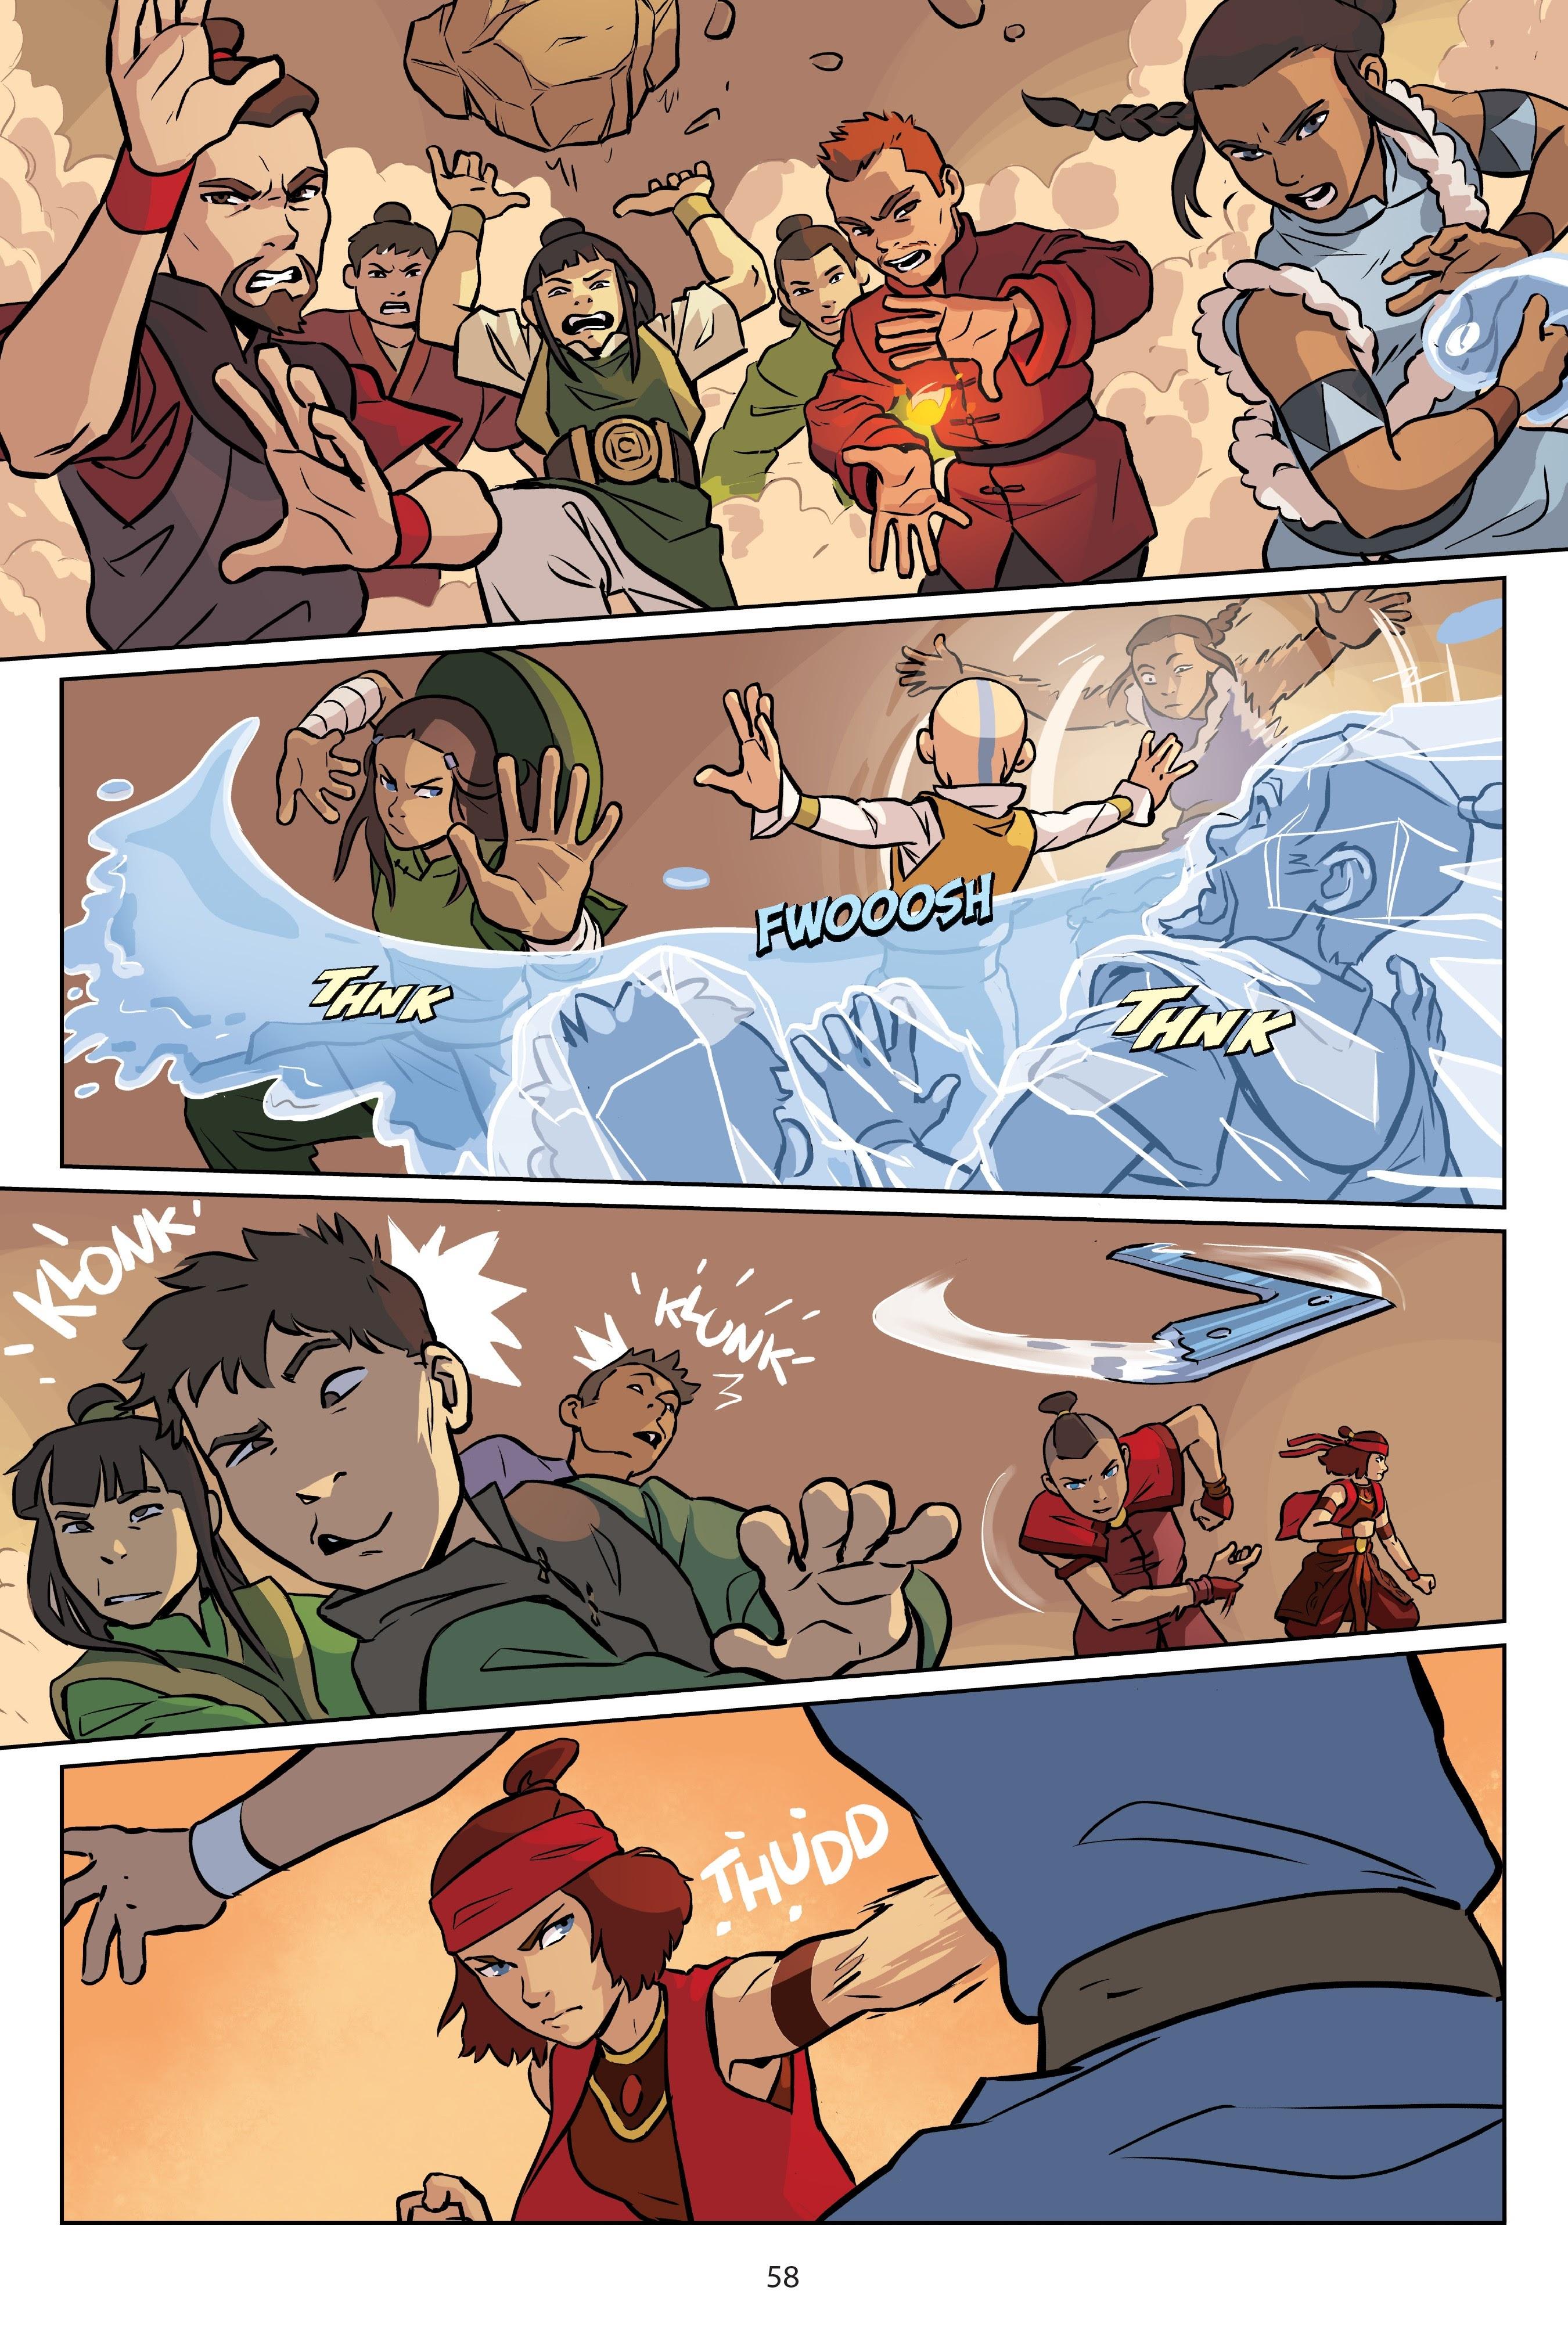 Nickelodeon Avatar: The Last Airbender - Imbalance TPB_2 Page 58